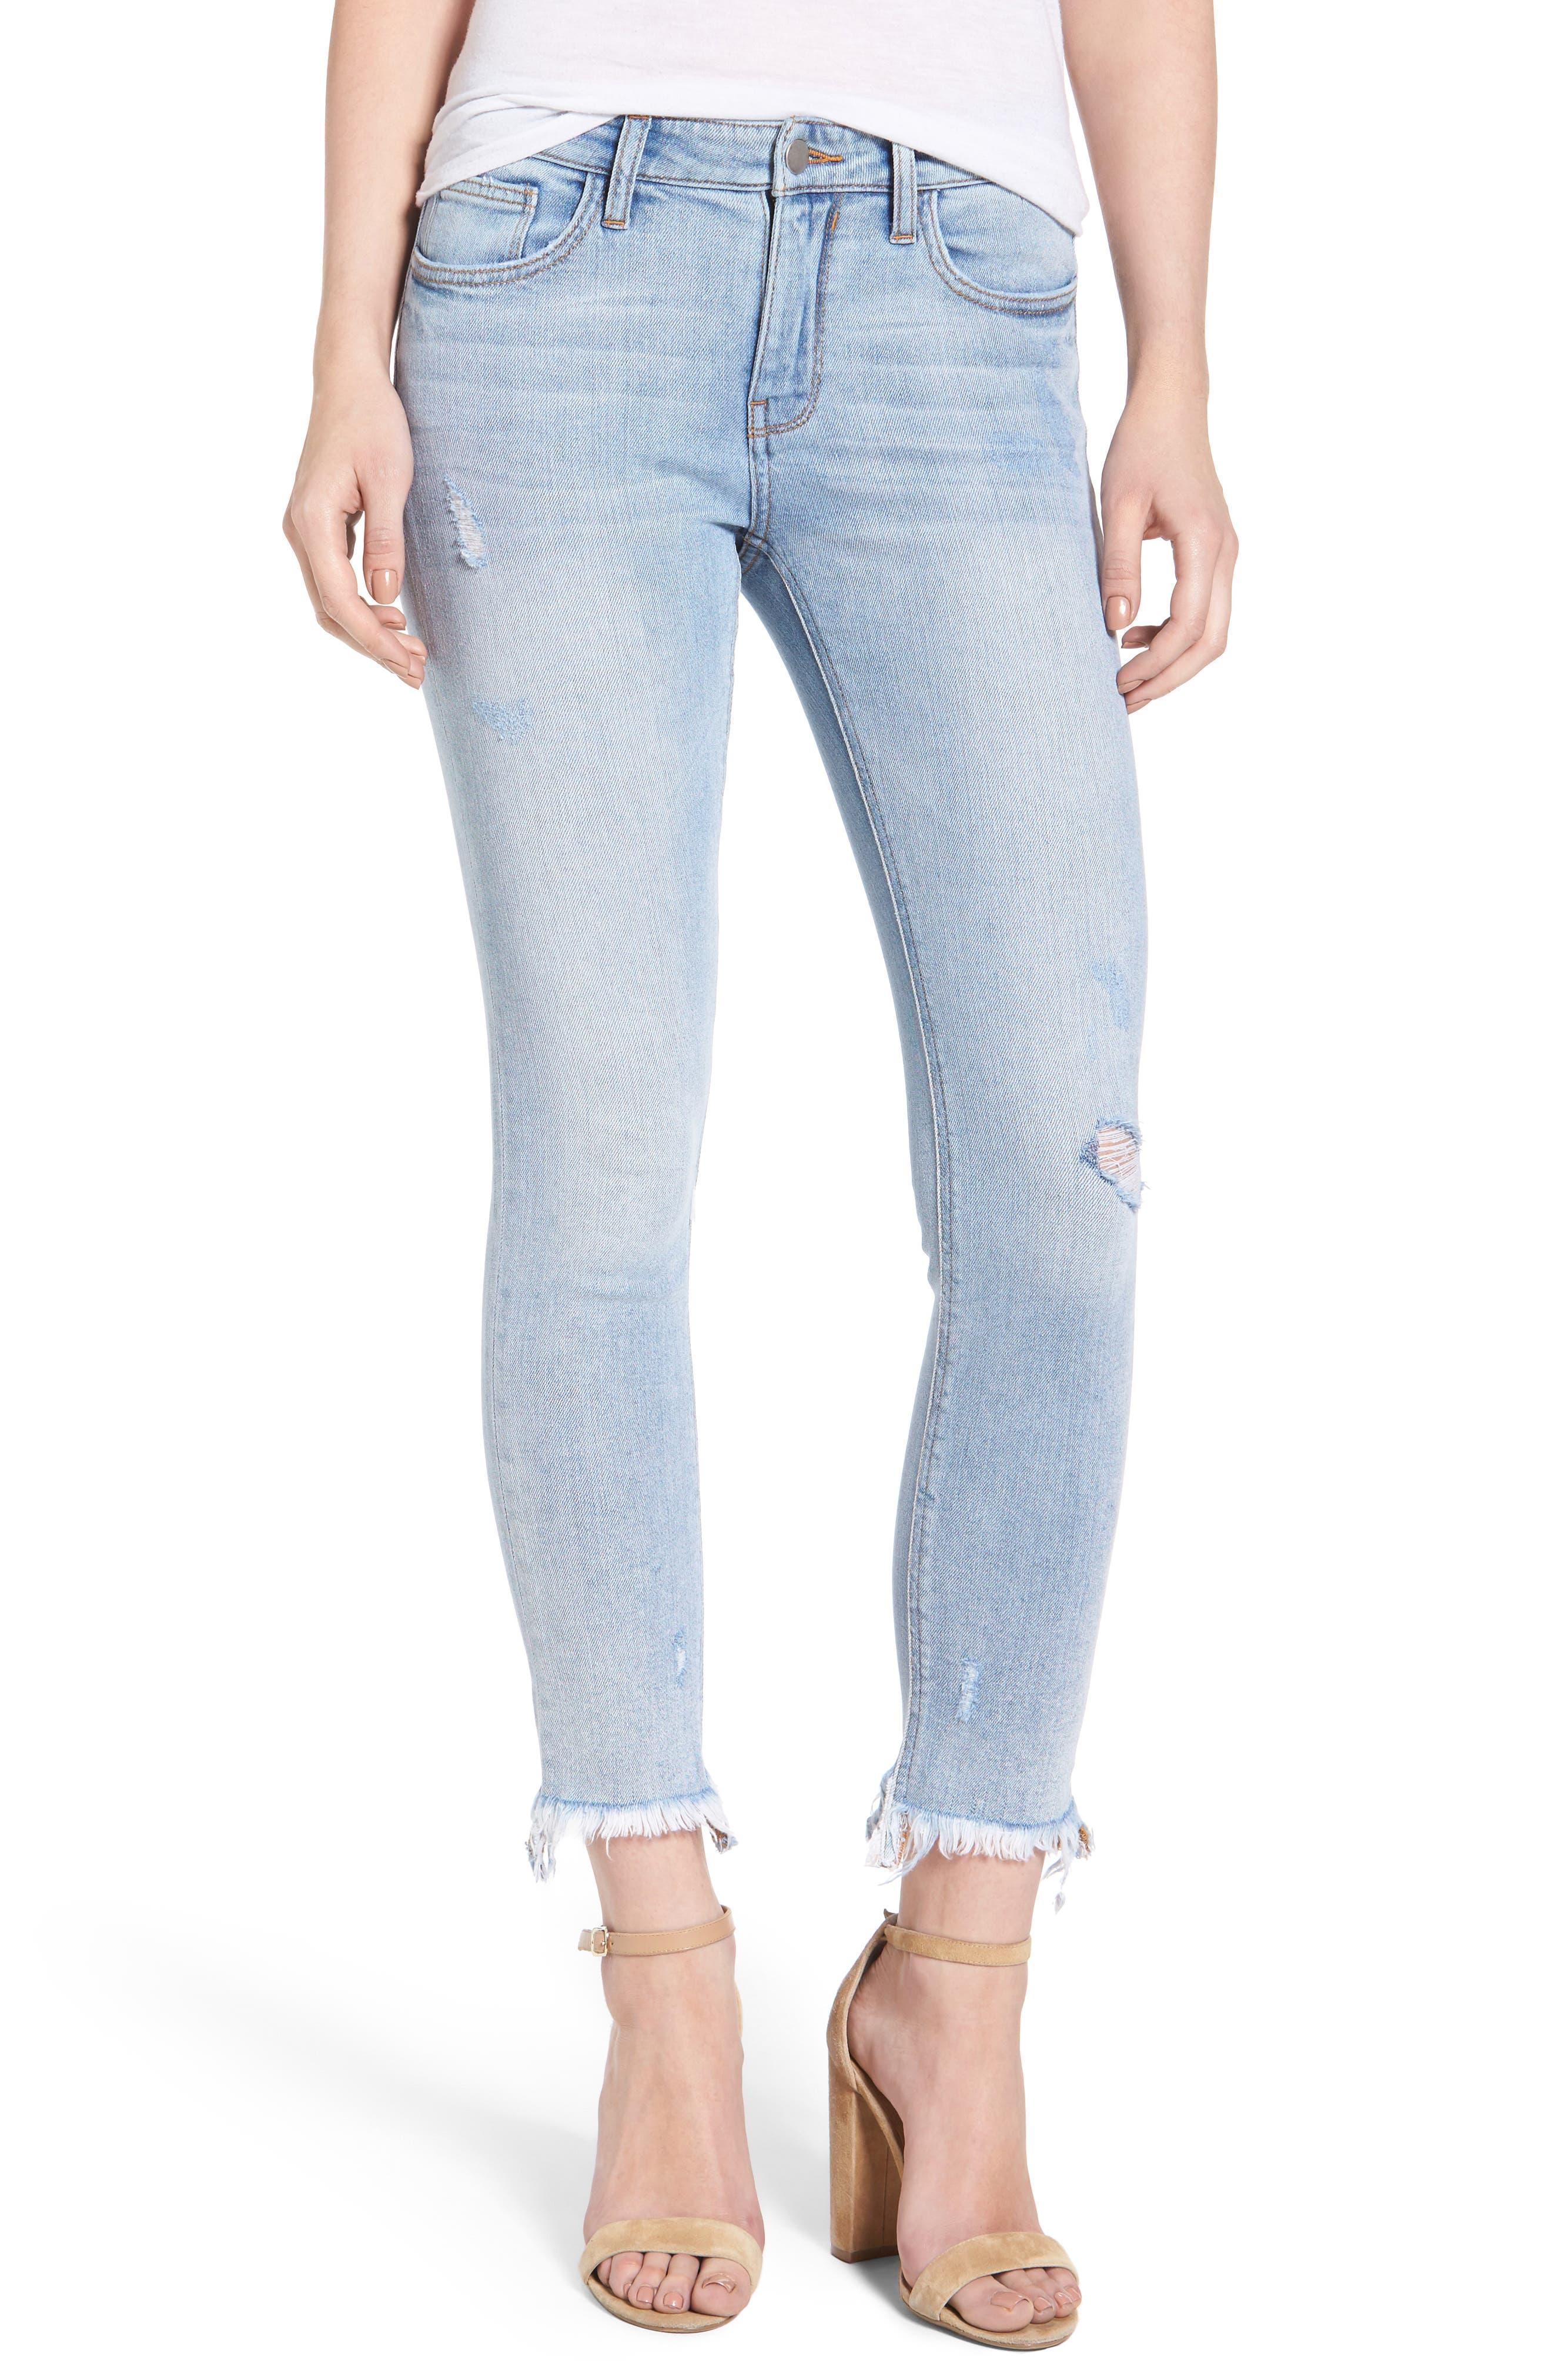 EVIDNT Frayed Hem Ankle Skinny Jeans